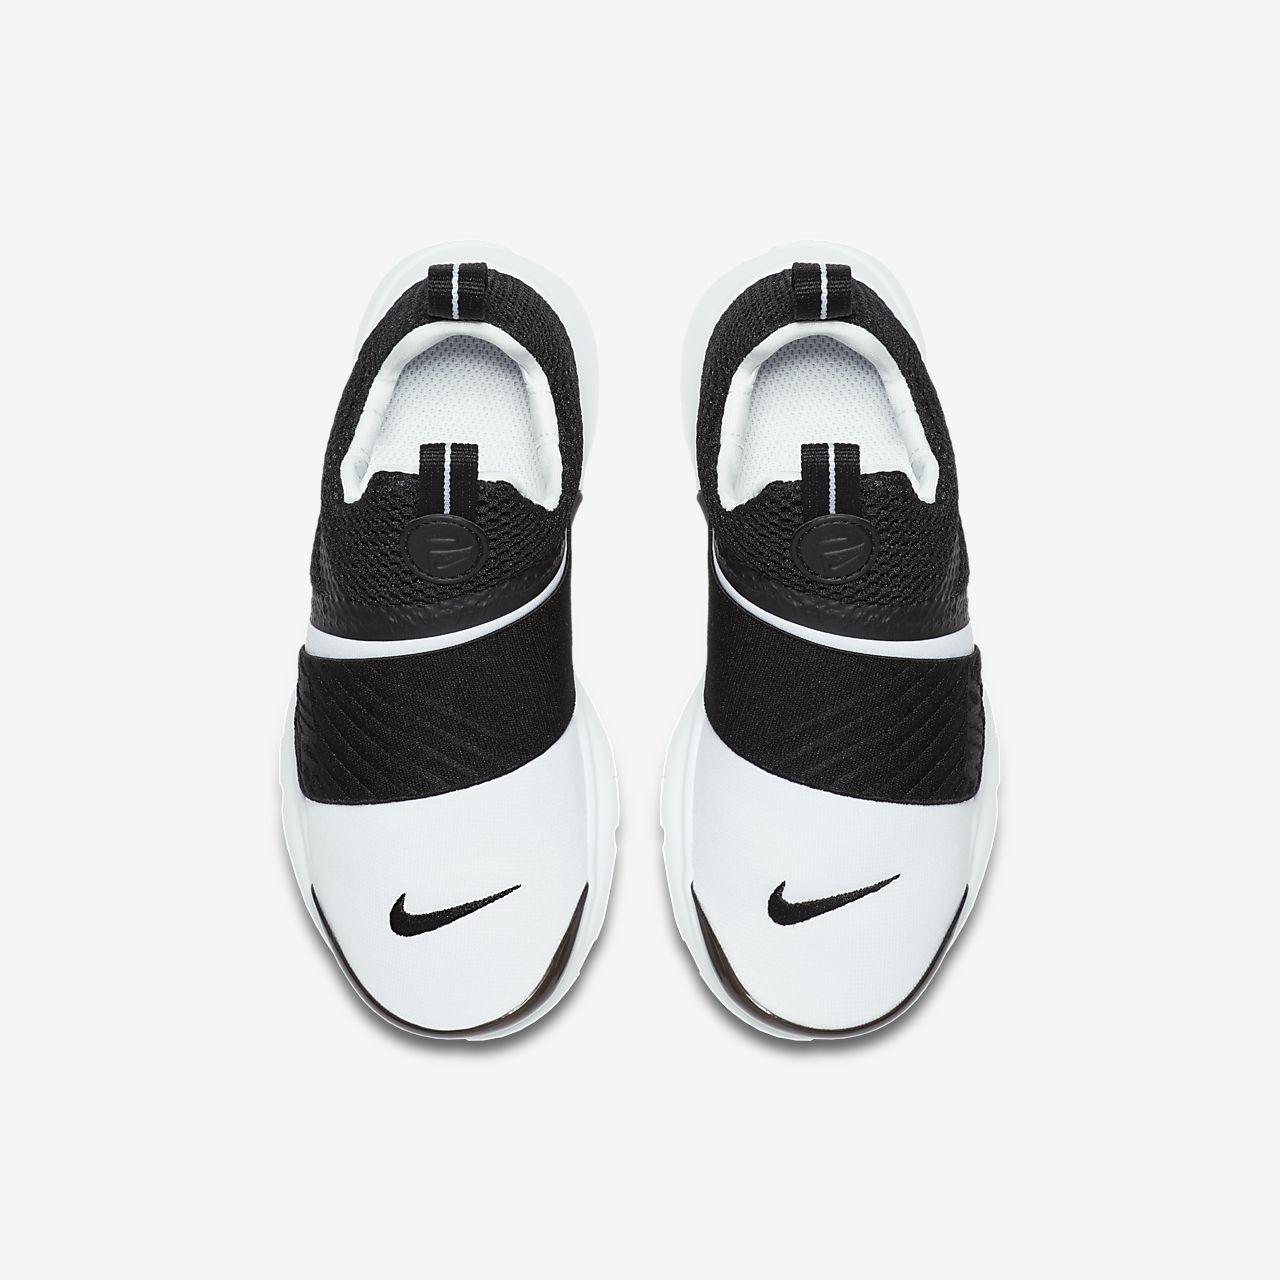 ... Nike Presto Extreme Younger Kids' Shoe